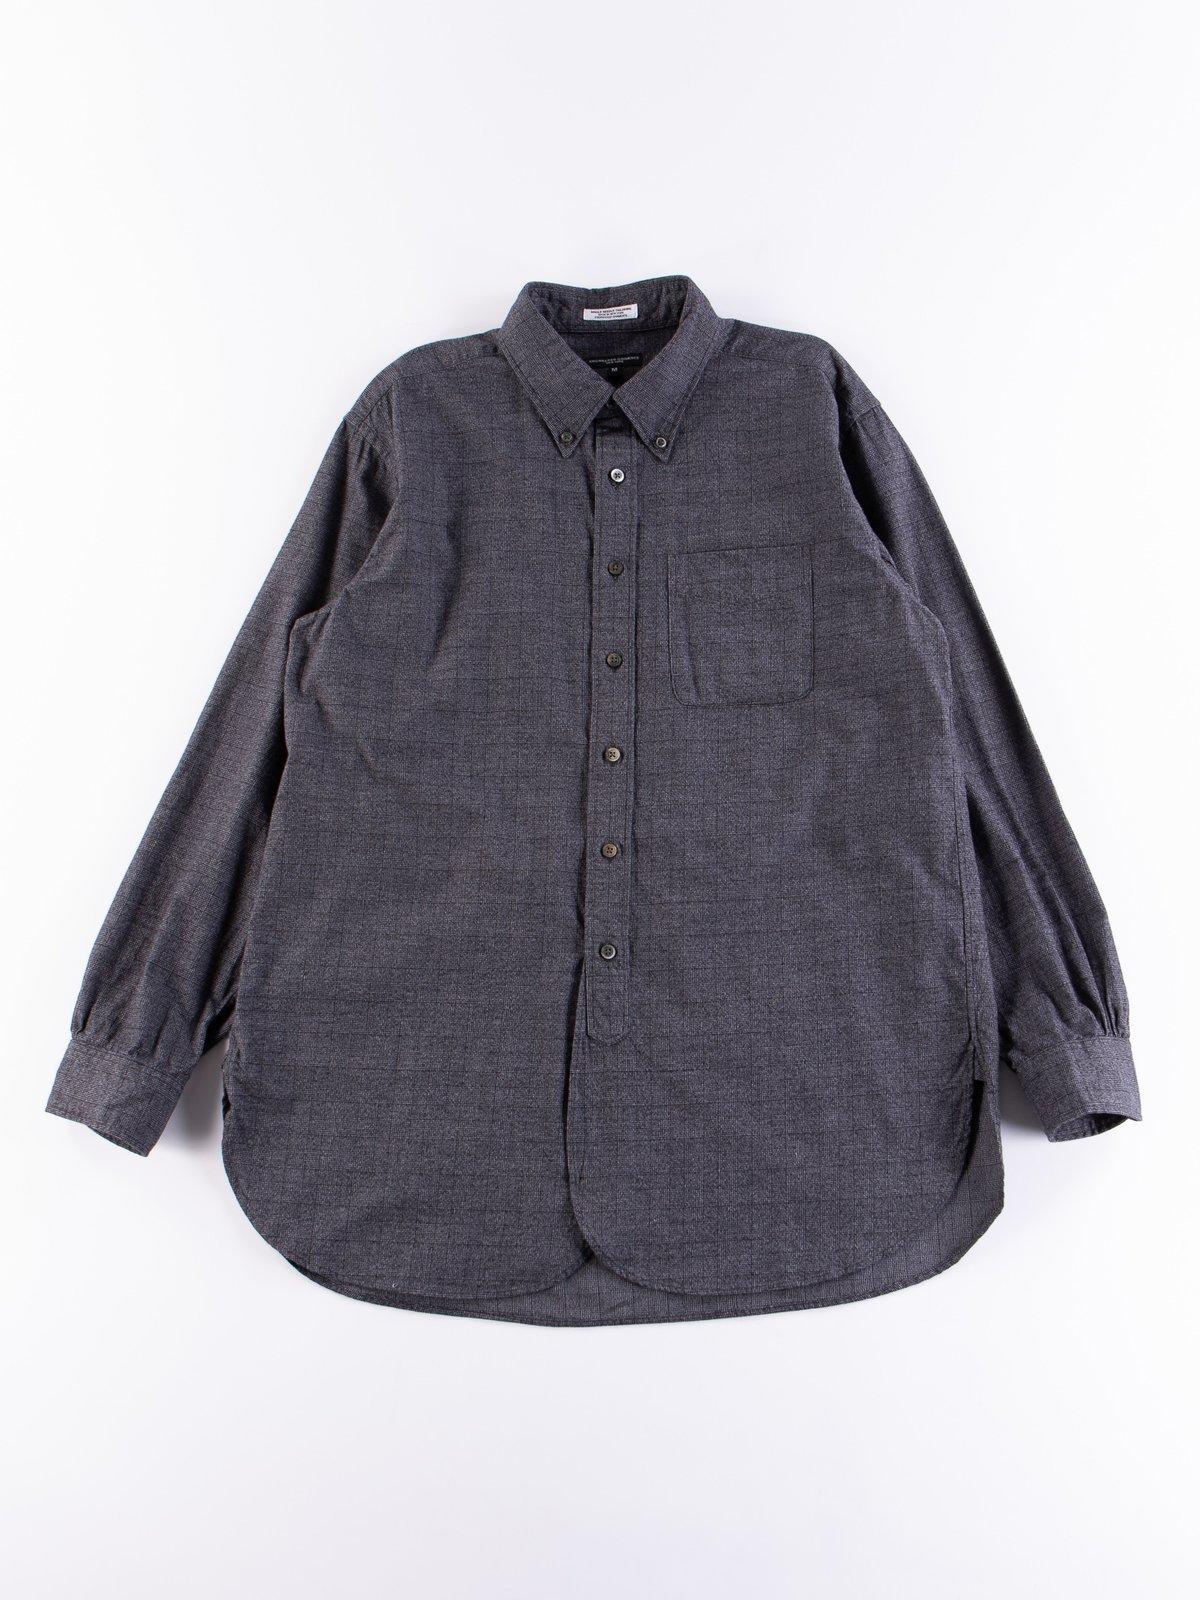 Grey Cotton Glen Plaid 19th Century BD Shirt - Image 1